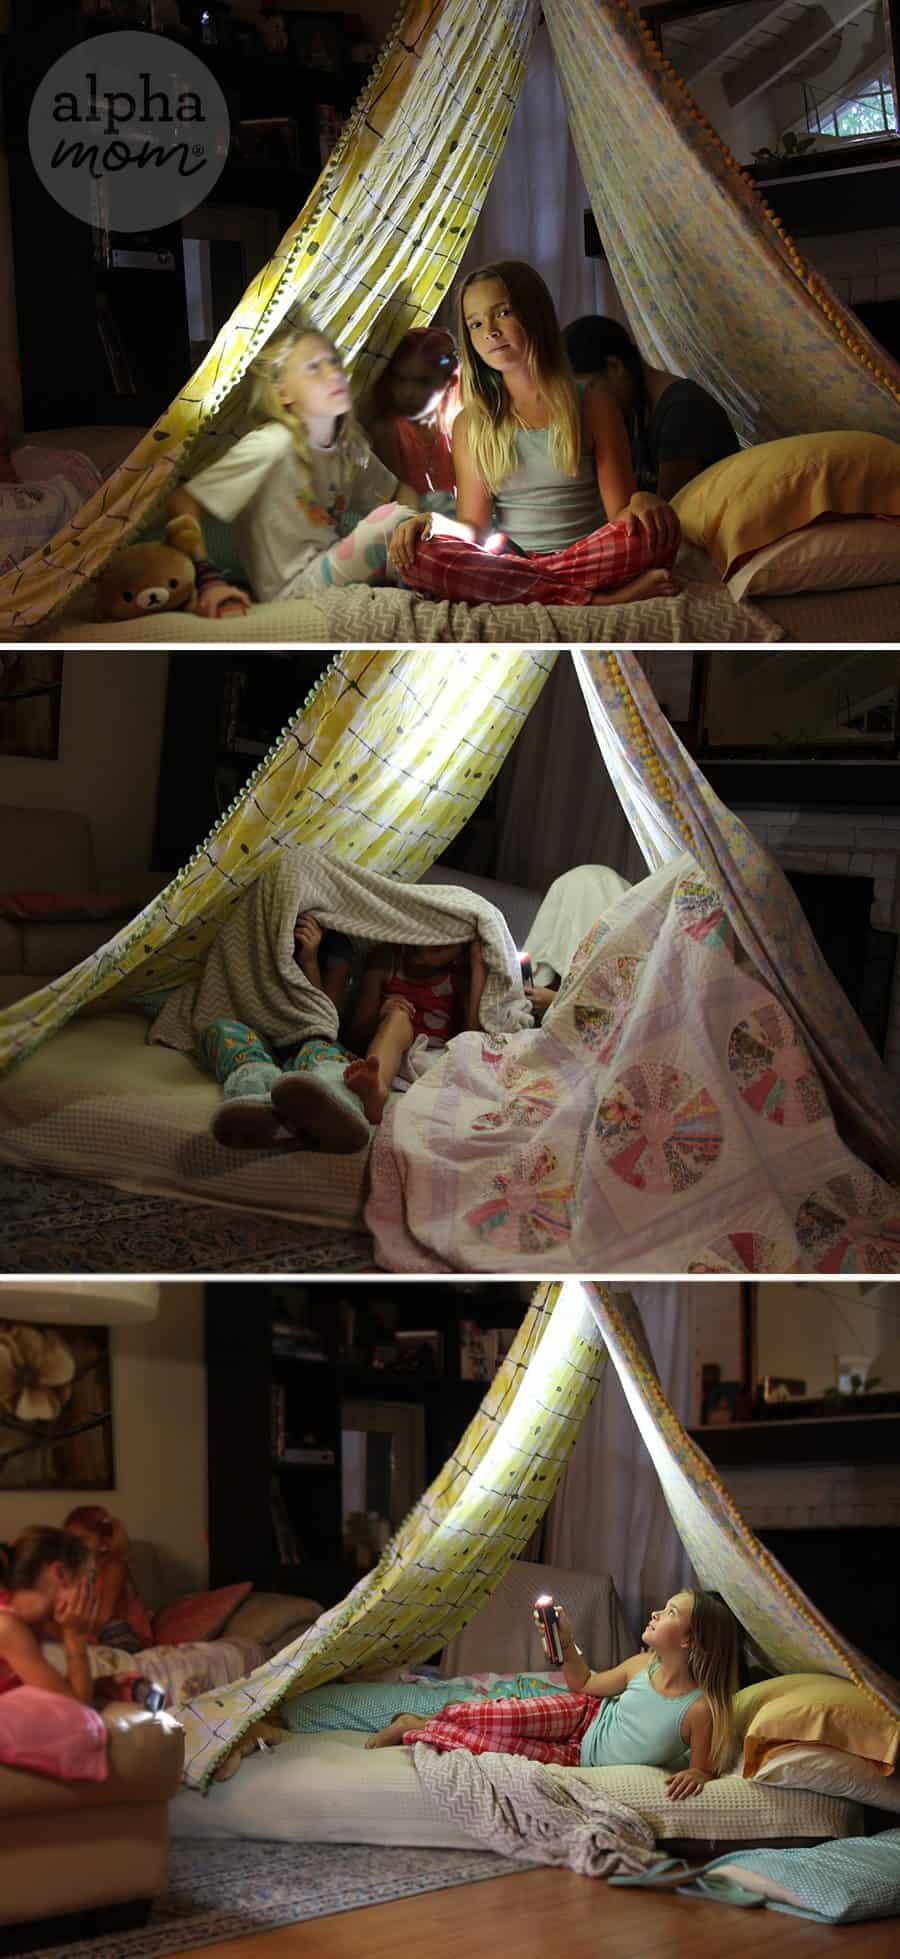 Morse Code Sleepover (tent) by Brenda Ponnay for Alphamom.com